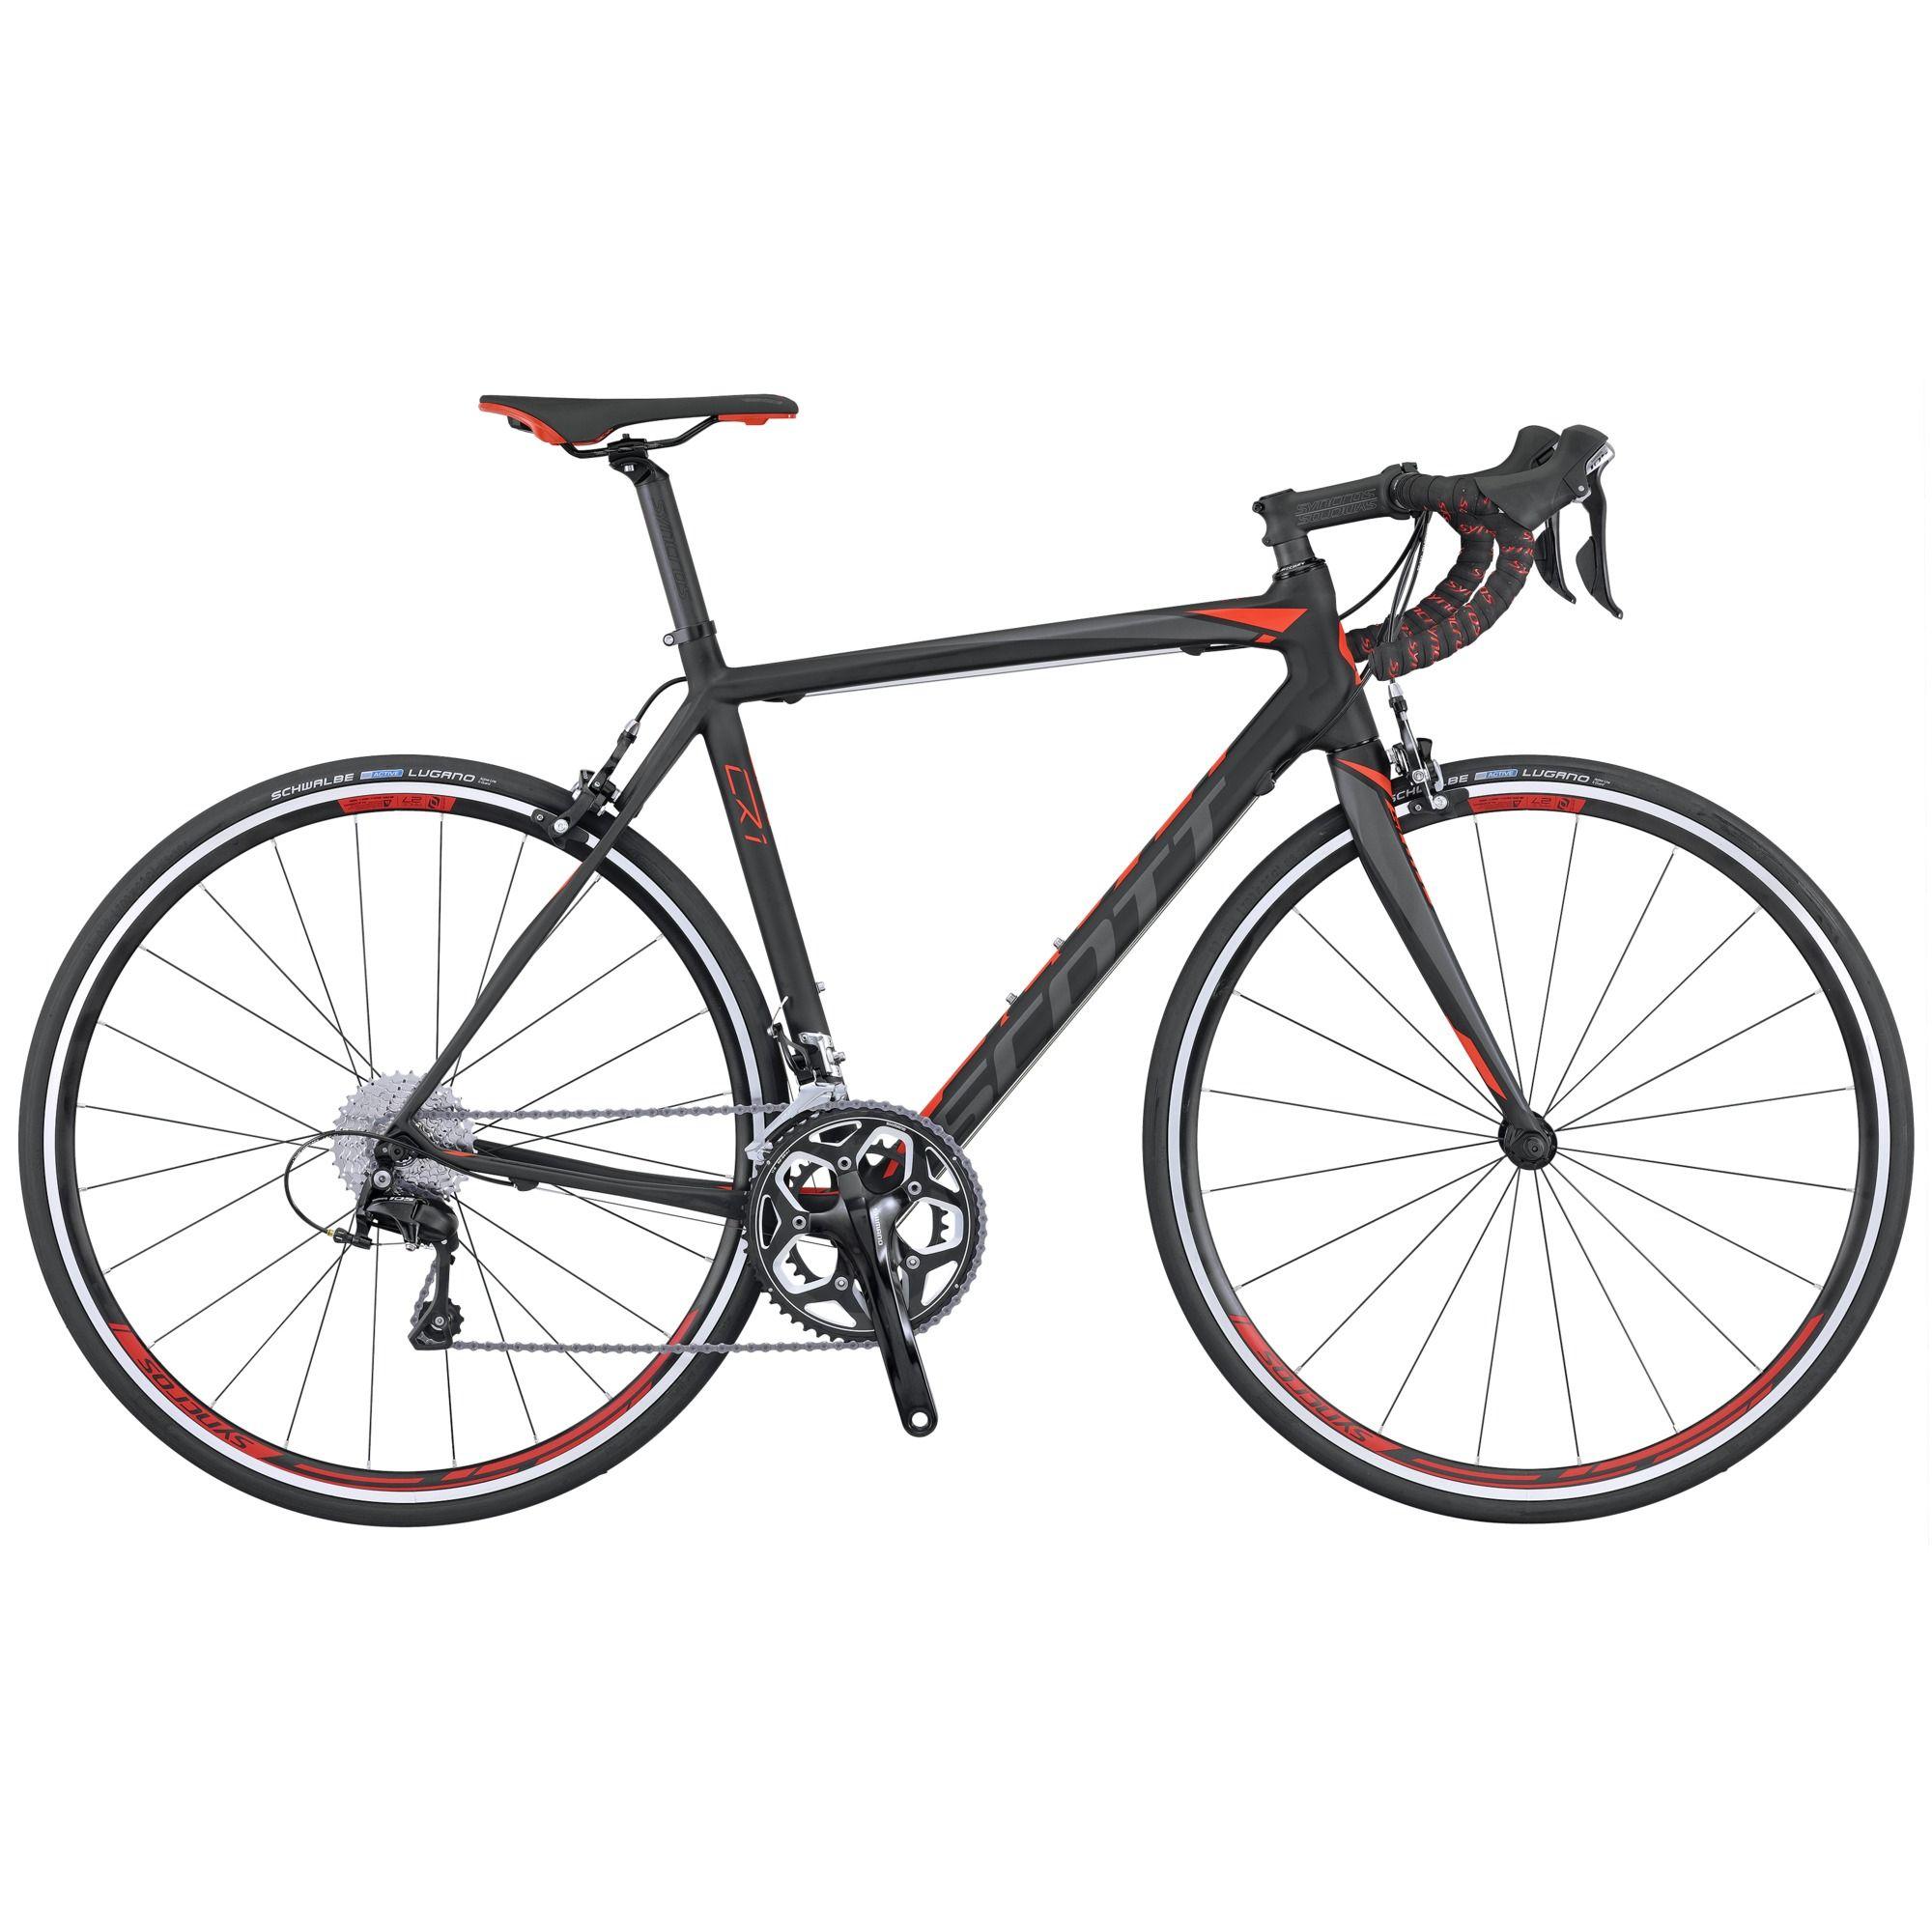 Велосипед ScottШоссейные<br><br><br>year: 2016<br>цвет: чёрный<br>пол: мужской<br>уровень оборудования: продвинутый<br>рулевая колонка: Ritchey Int. Cartridge<br>вынос: Syncros FL2.0, 1 1/8 / four Bolt 31.8 мм<br>руль: Syncros RR2.0, Anatomic 31.8 мм<br>передний тормоз: Shimano BR-R561, Super SLR Dual pivot<br>цепь: KMC X11<br>система: Shimano FC-RS500, Hyperdrive, 34x50T<br>каретка: Shimano BB - RS500-PB<br>ободья: Syncros Race 27 Aero Profile, спереди: 20H, сзади: 24H<br>передняя втулка: Formula Team, 20H<br>задняя втулка: Formula Team, 24H<br>спицы: 14G Stainless, 2 мм<br>передняя покрышка: Schwalbe Lugano, 700 x 23C<br>задняя покрышка: Schwalbe Lugano, 700 x 23C<br>седло: Syncros FL2.5<br>подседельный штырь: Syncros RR1.4 Carbon/AL, 31.6 мм<br>кассета: Shimano 105 CS-5800, 11-32T<br>манетки: Shimano 105 ST-5800, Dual control<br>вес: 8.16 кг<br>рама: CR1 Carbon / IMP Carbon technology / Road Comfort geometry / INT BB<br>вилка: CR1 Carbon 1 1/8 Carbon steerer, Alloy Dropout<br>размер рамы: 20.5&amp;amp;quot;<br>материал рамы: карбон<br>тип тормозов: ободной<br>передний переключатель: Shimano 105 FD-5800<br>задний переключатель: Shimano 105 RD-5800-GS<br>количество скоростей: 22